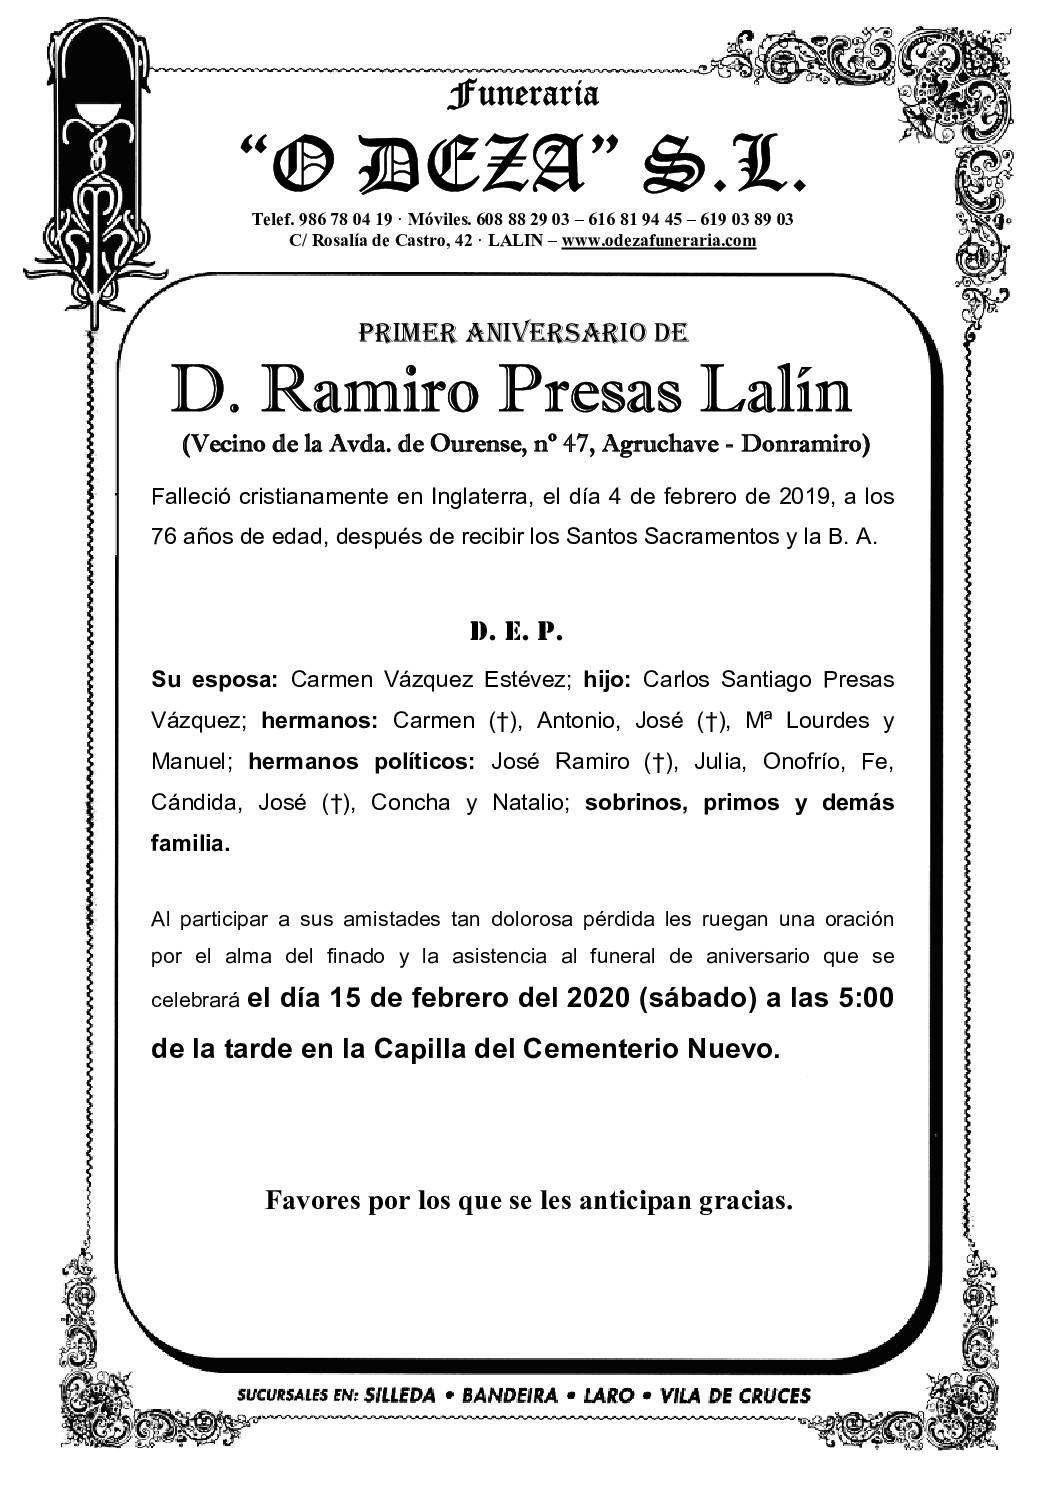 D. RAMIRO PRESAS LALIN